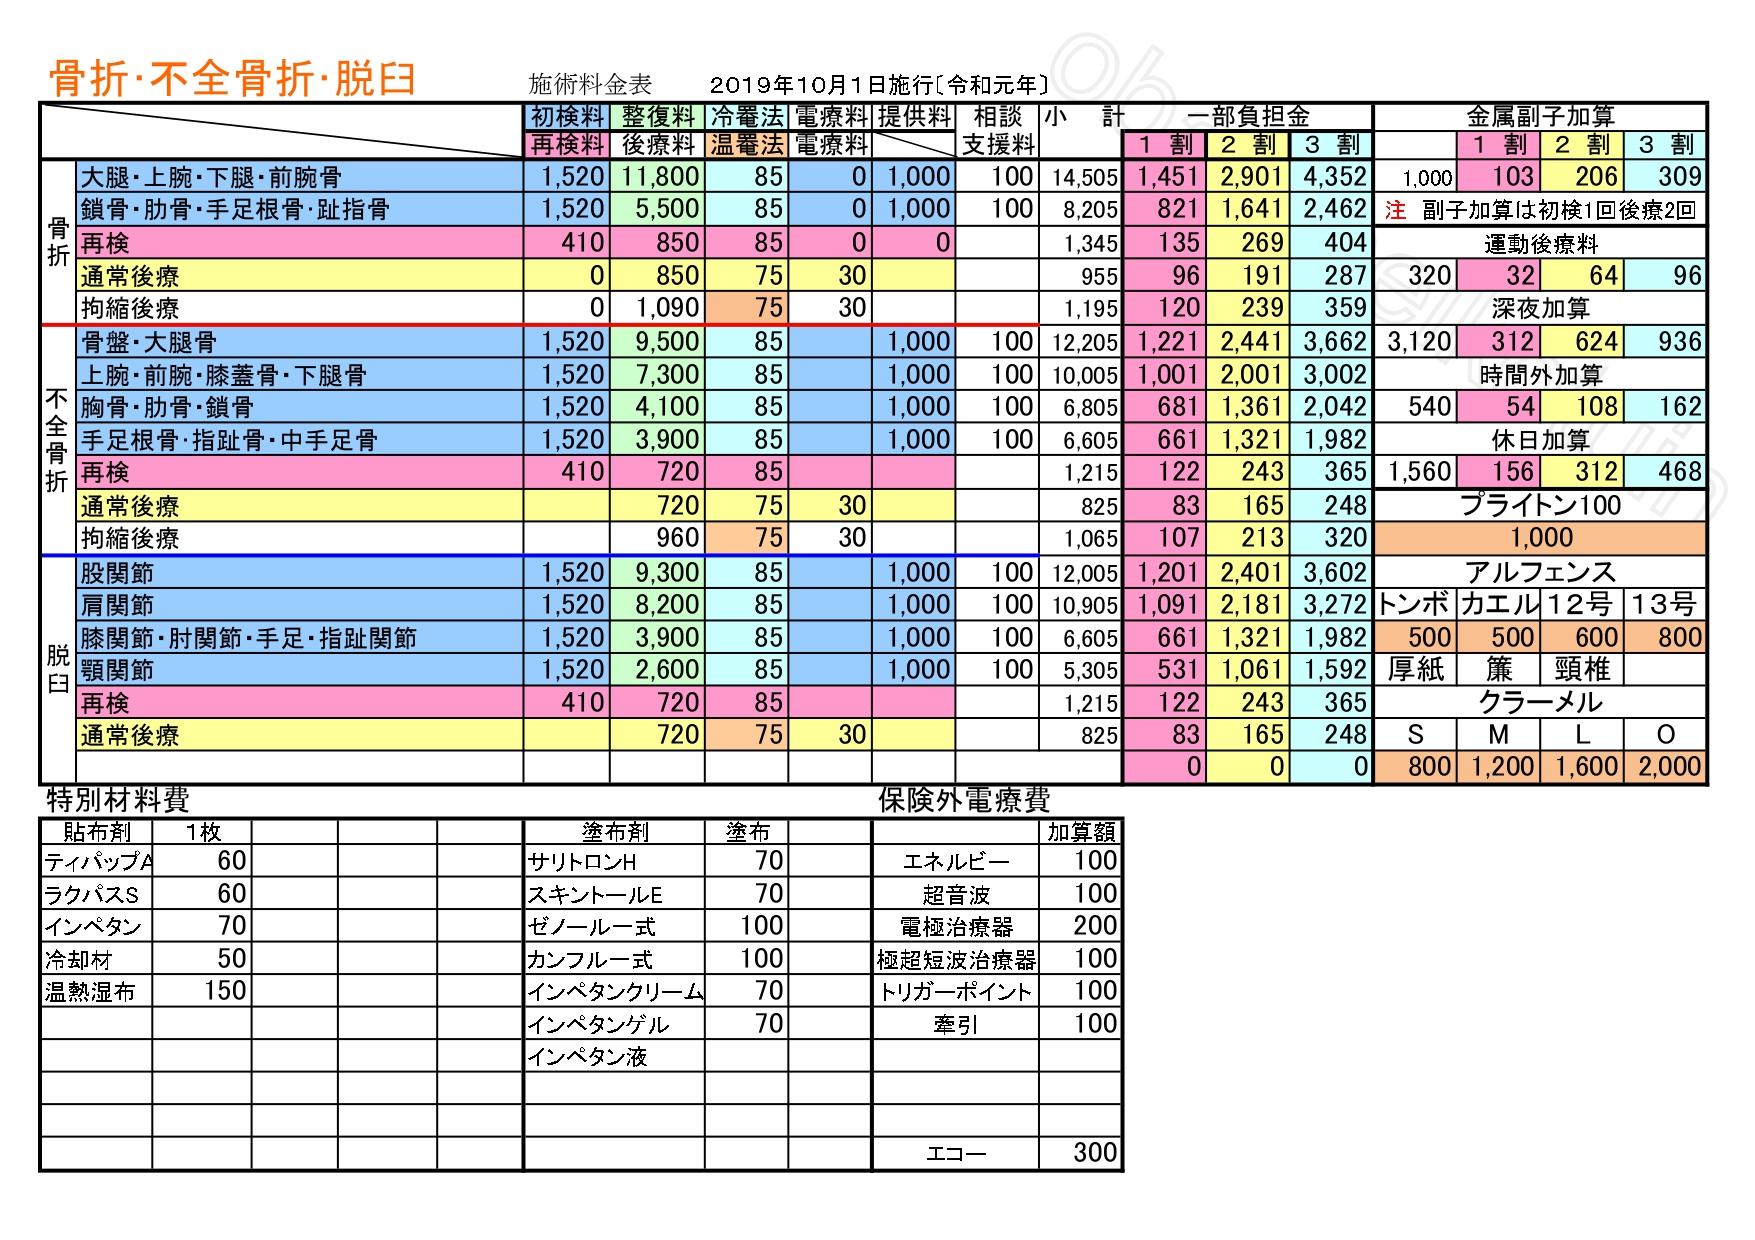 料金表2020.12.01R2 (1)_page-0002.jpg